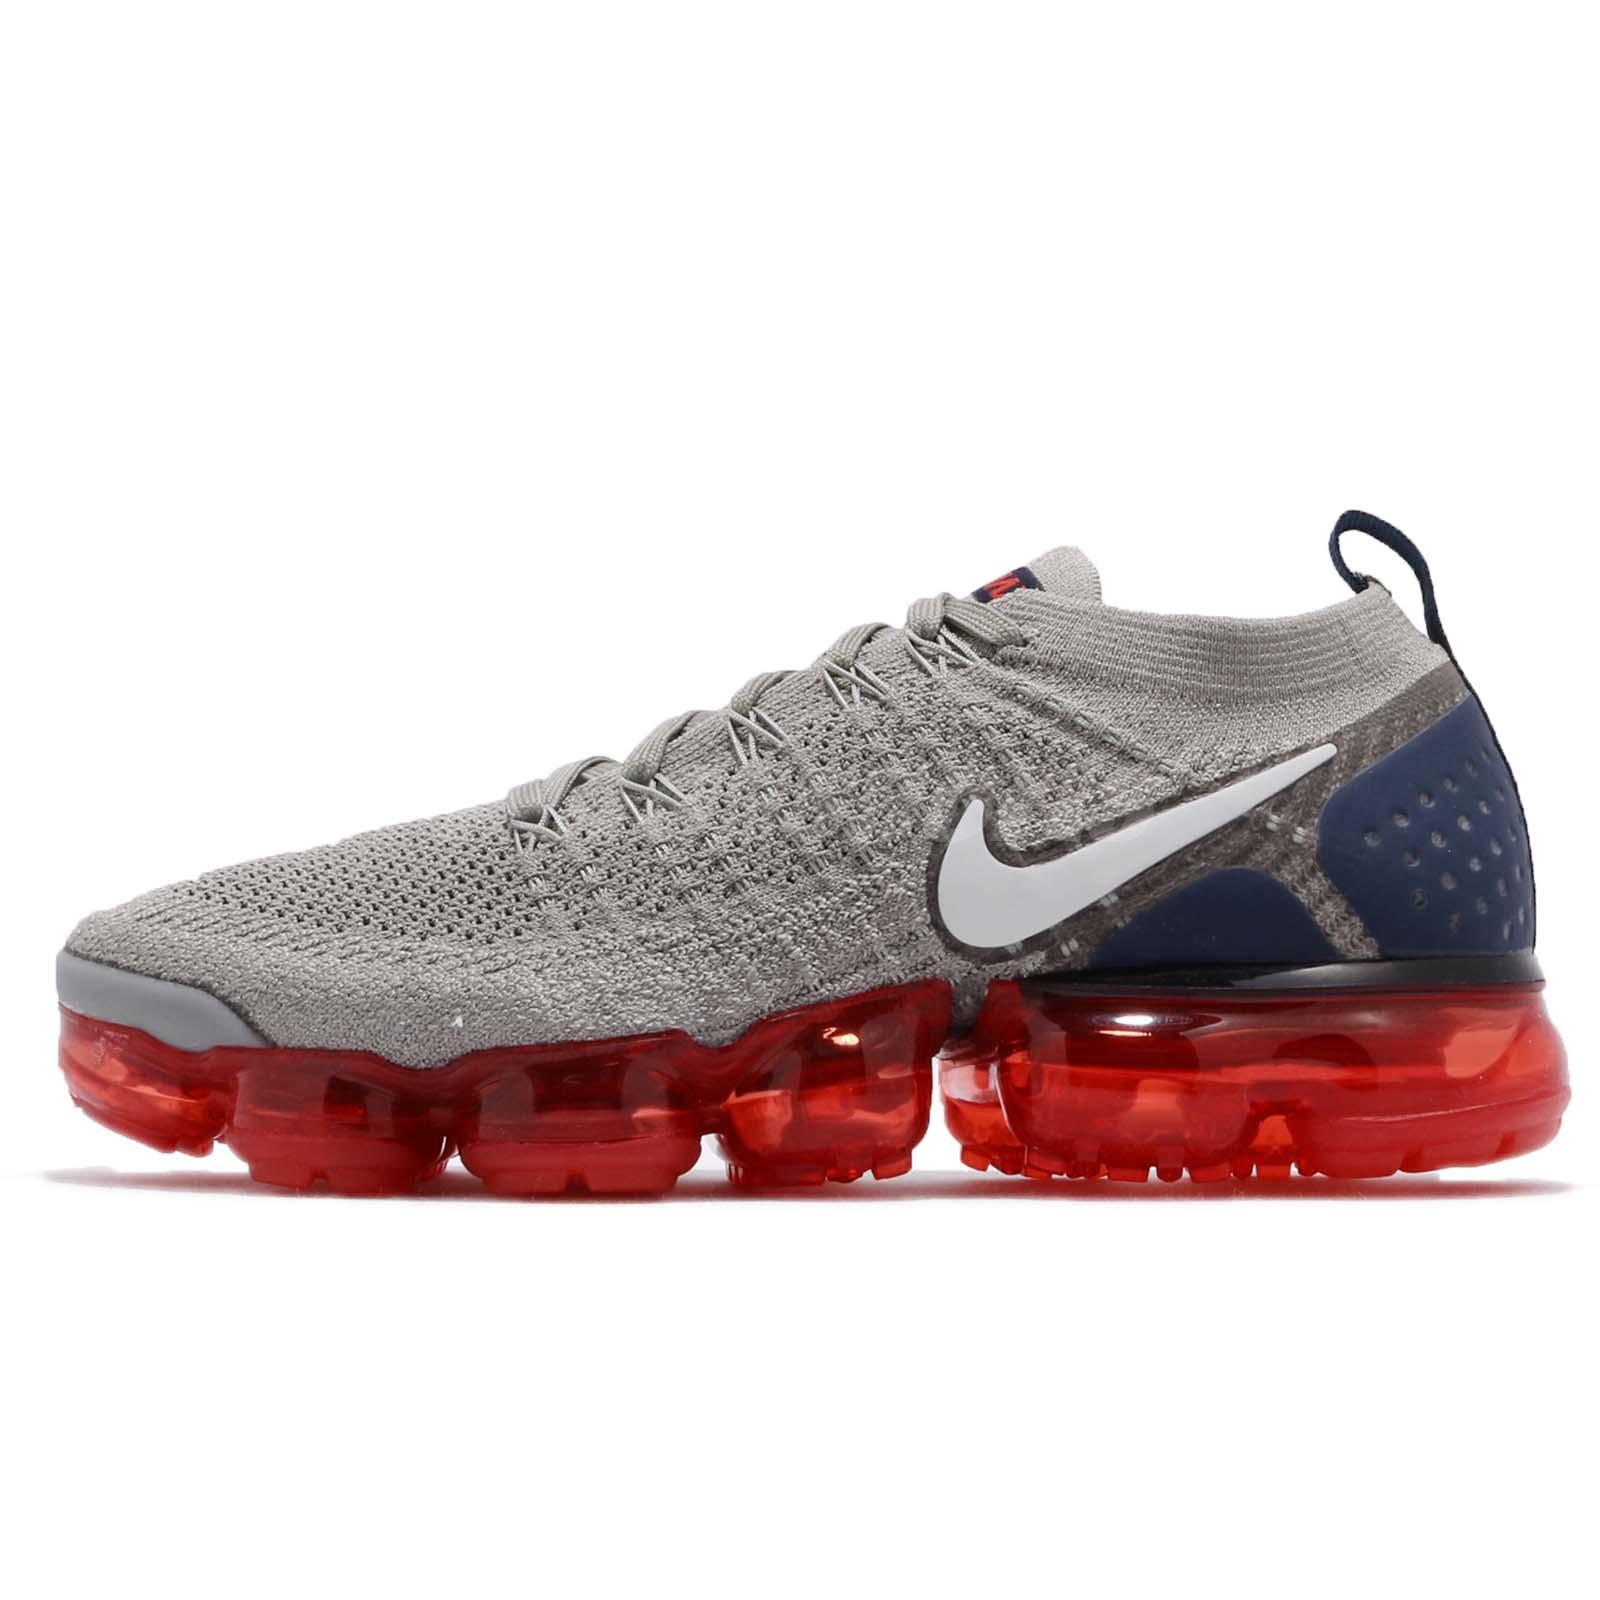 e12b9d110cc Nike Nike Air Vapormax Flyknit 2 II Dark Stucco Navy Red Men Shoes 942842- 010